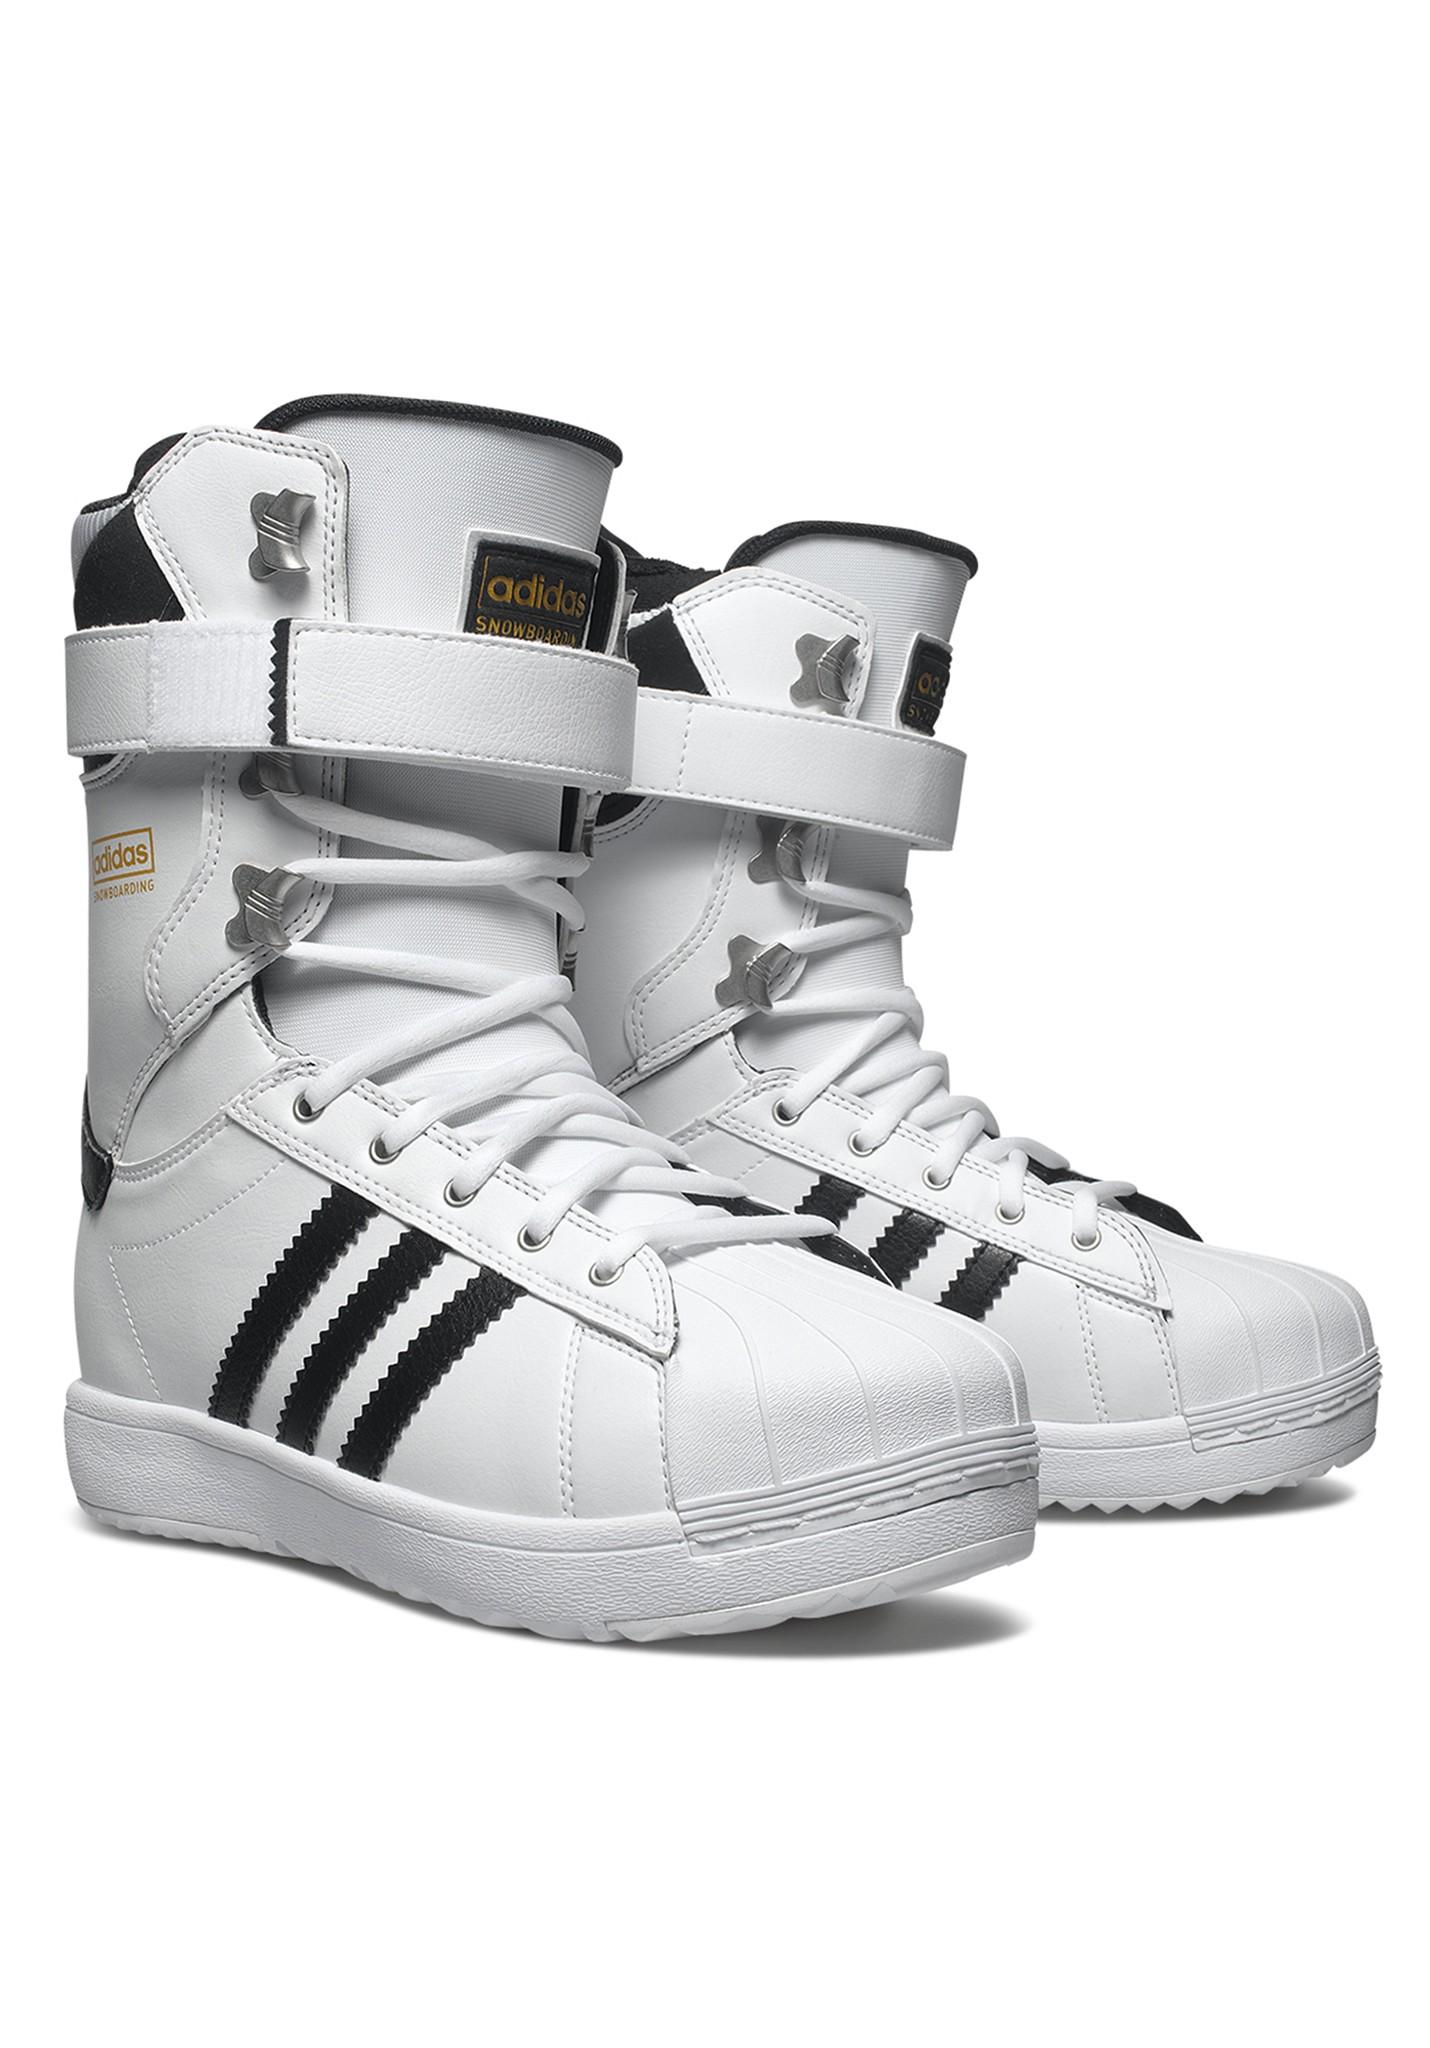 neu adidas the superstar herren snowboard boots snow schuhe stiefel ebay. Black Bedroom Furniture Sets. Home Design Ideas